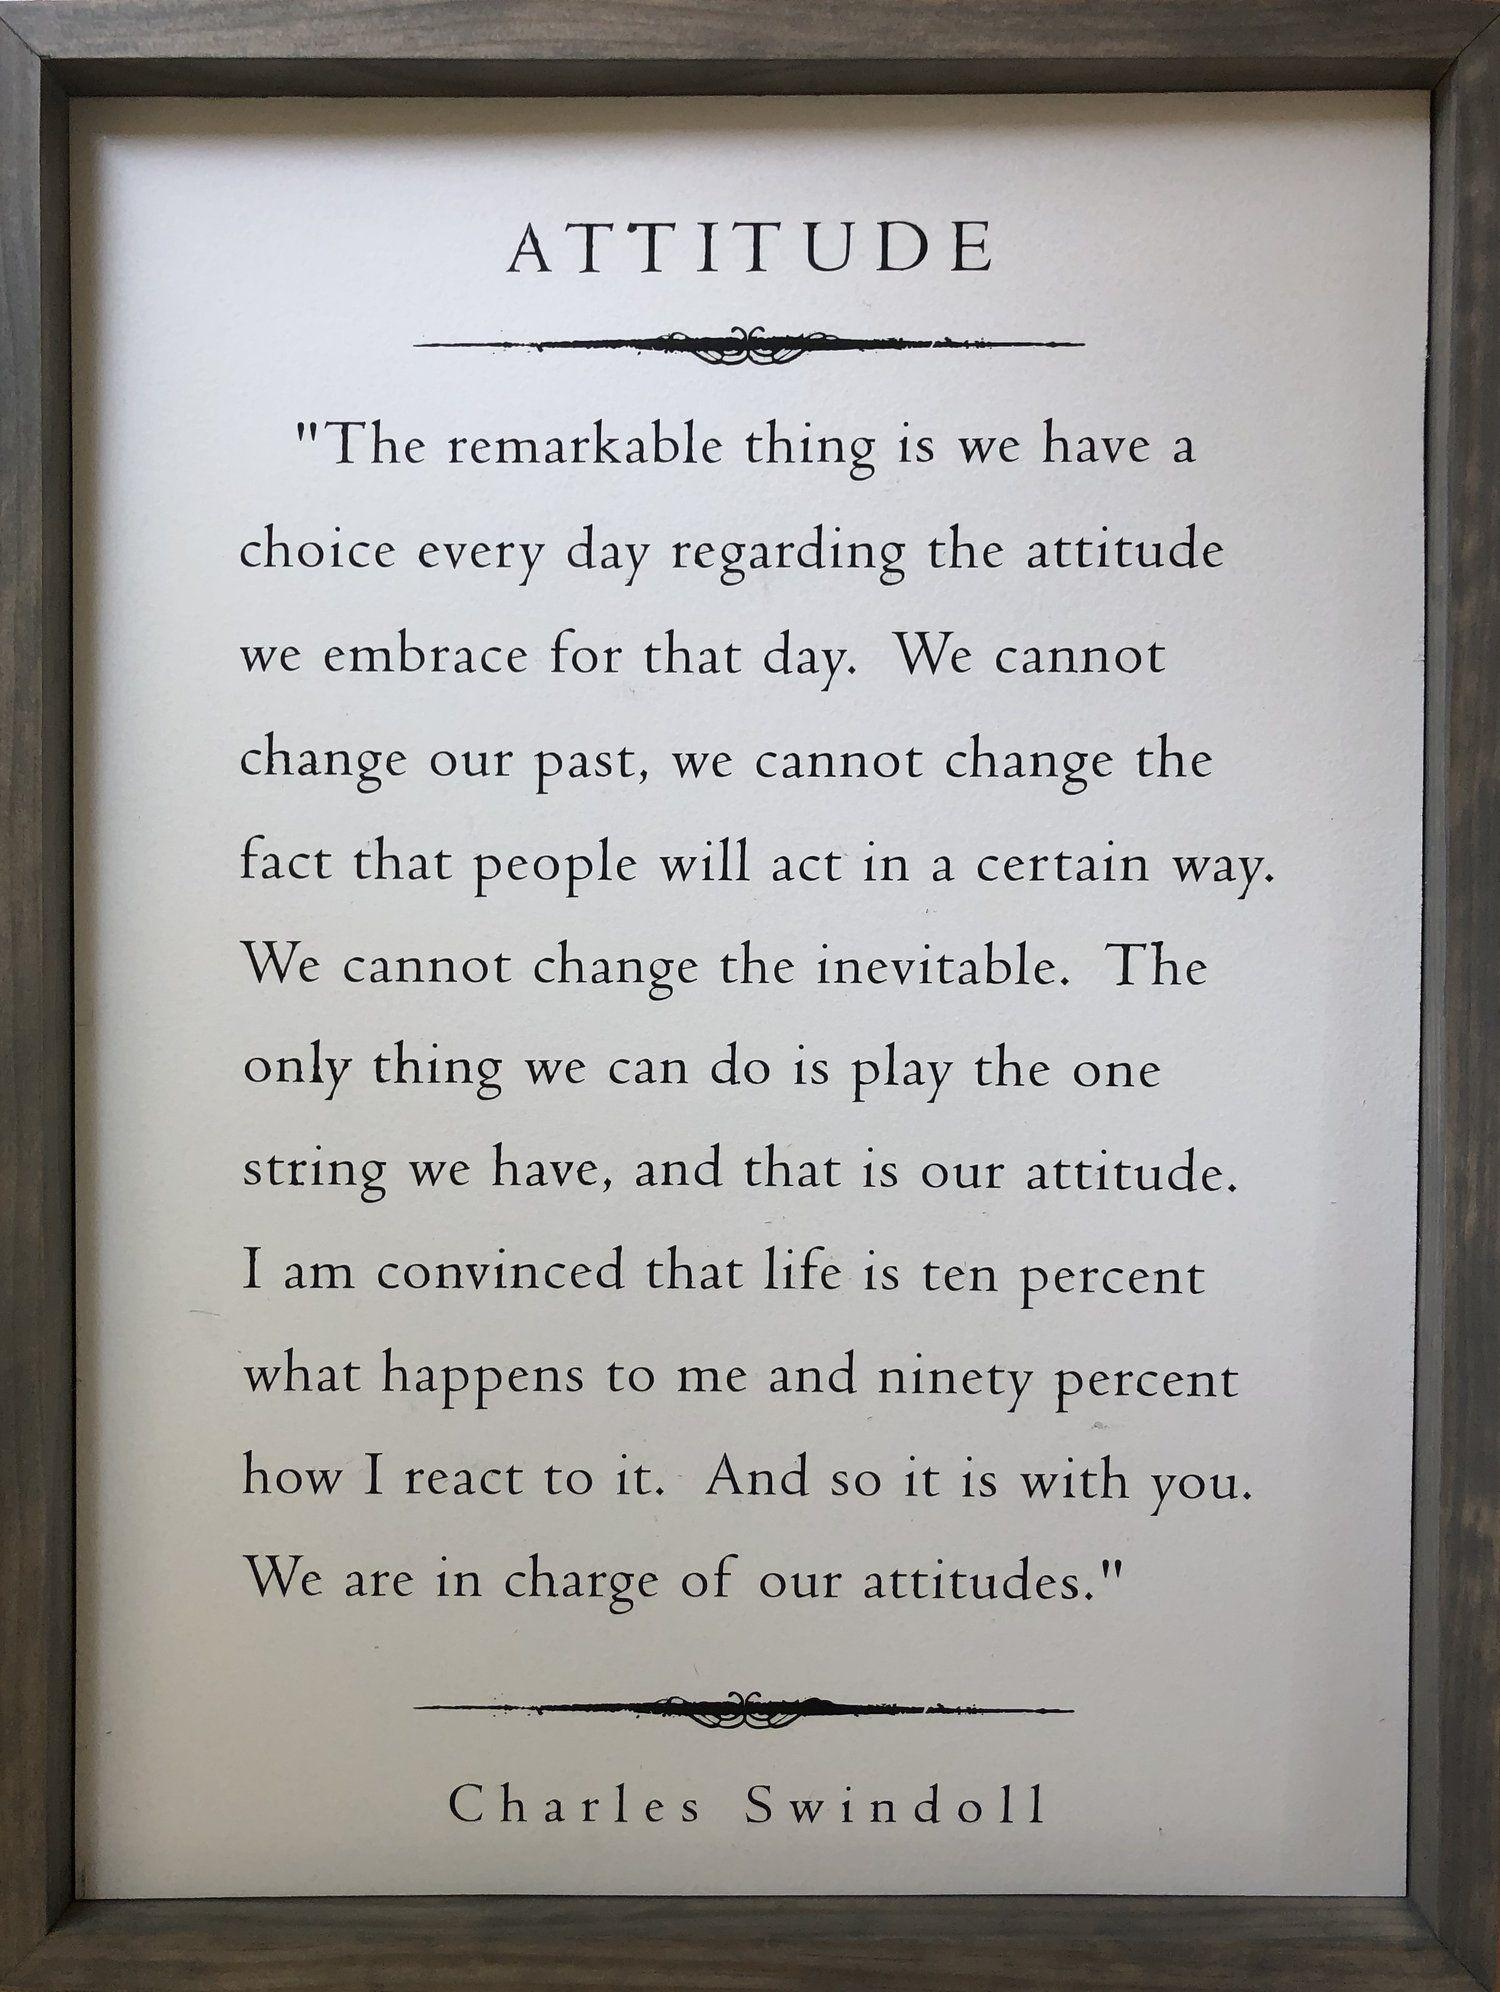 Attitude - Charles Swindoll — This Beautiful Life